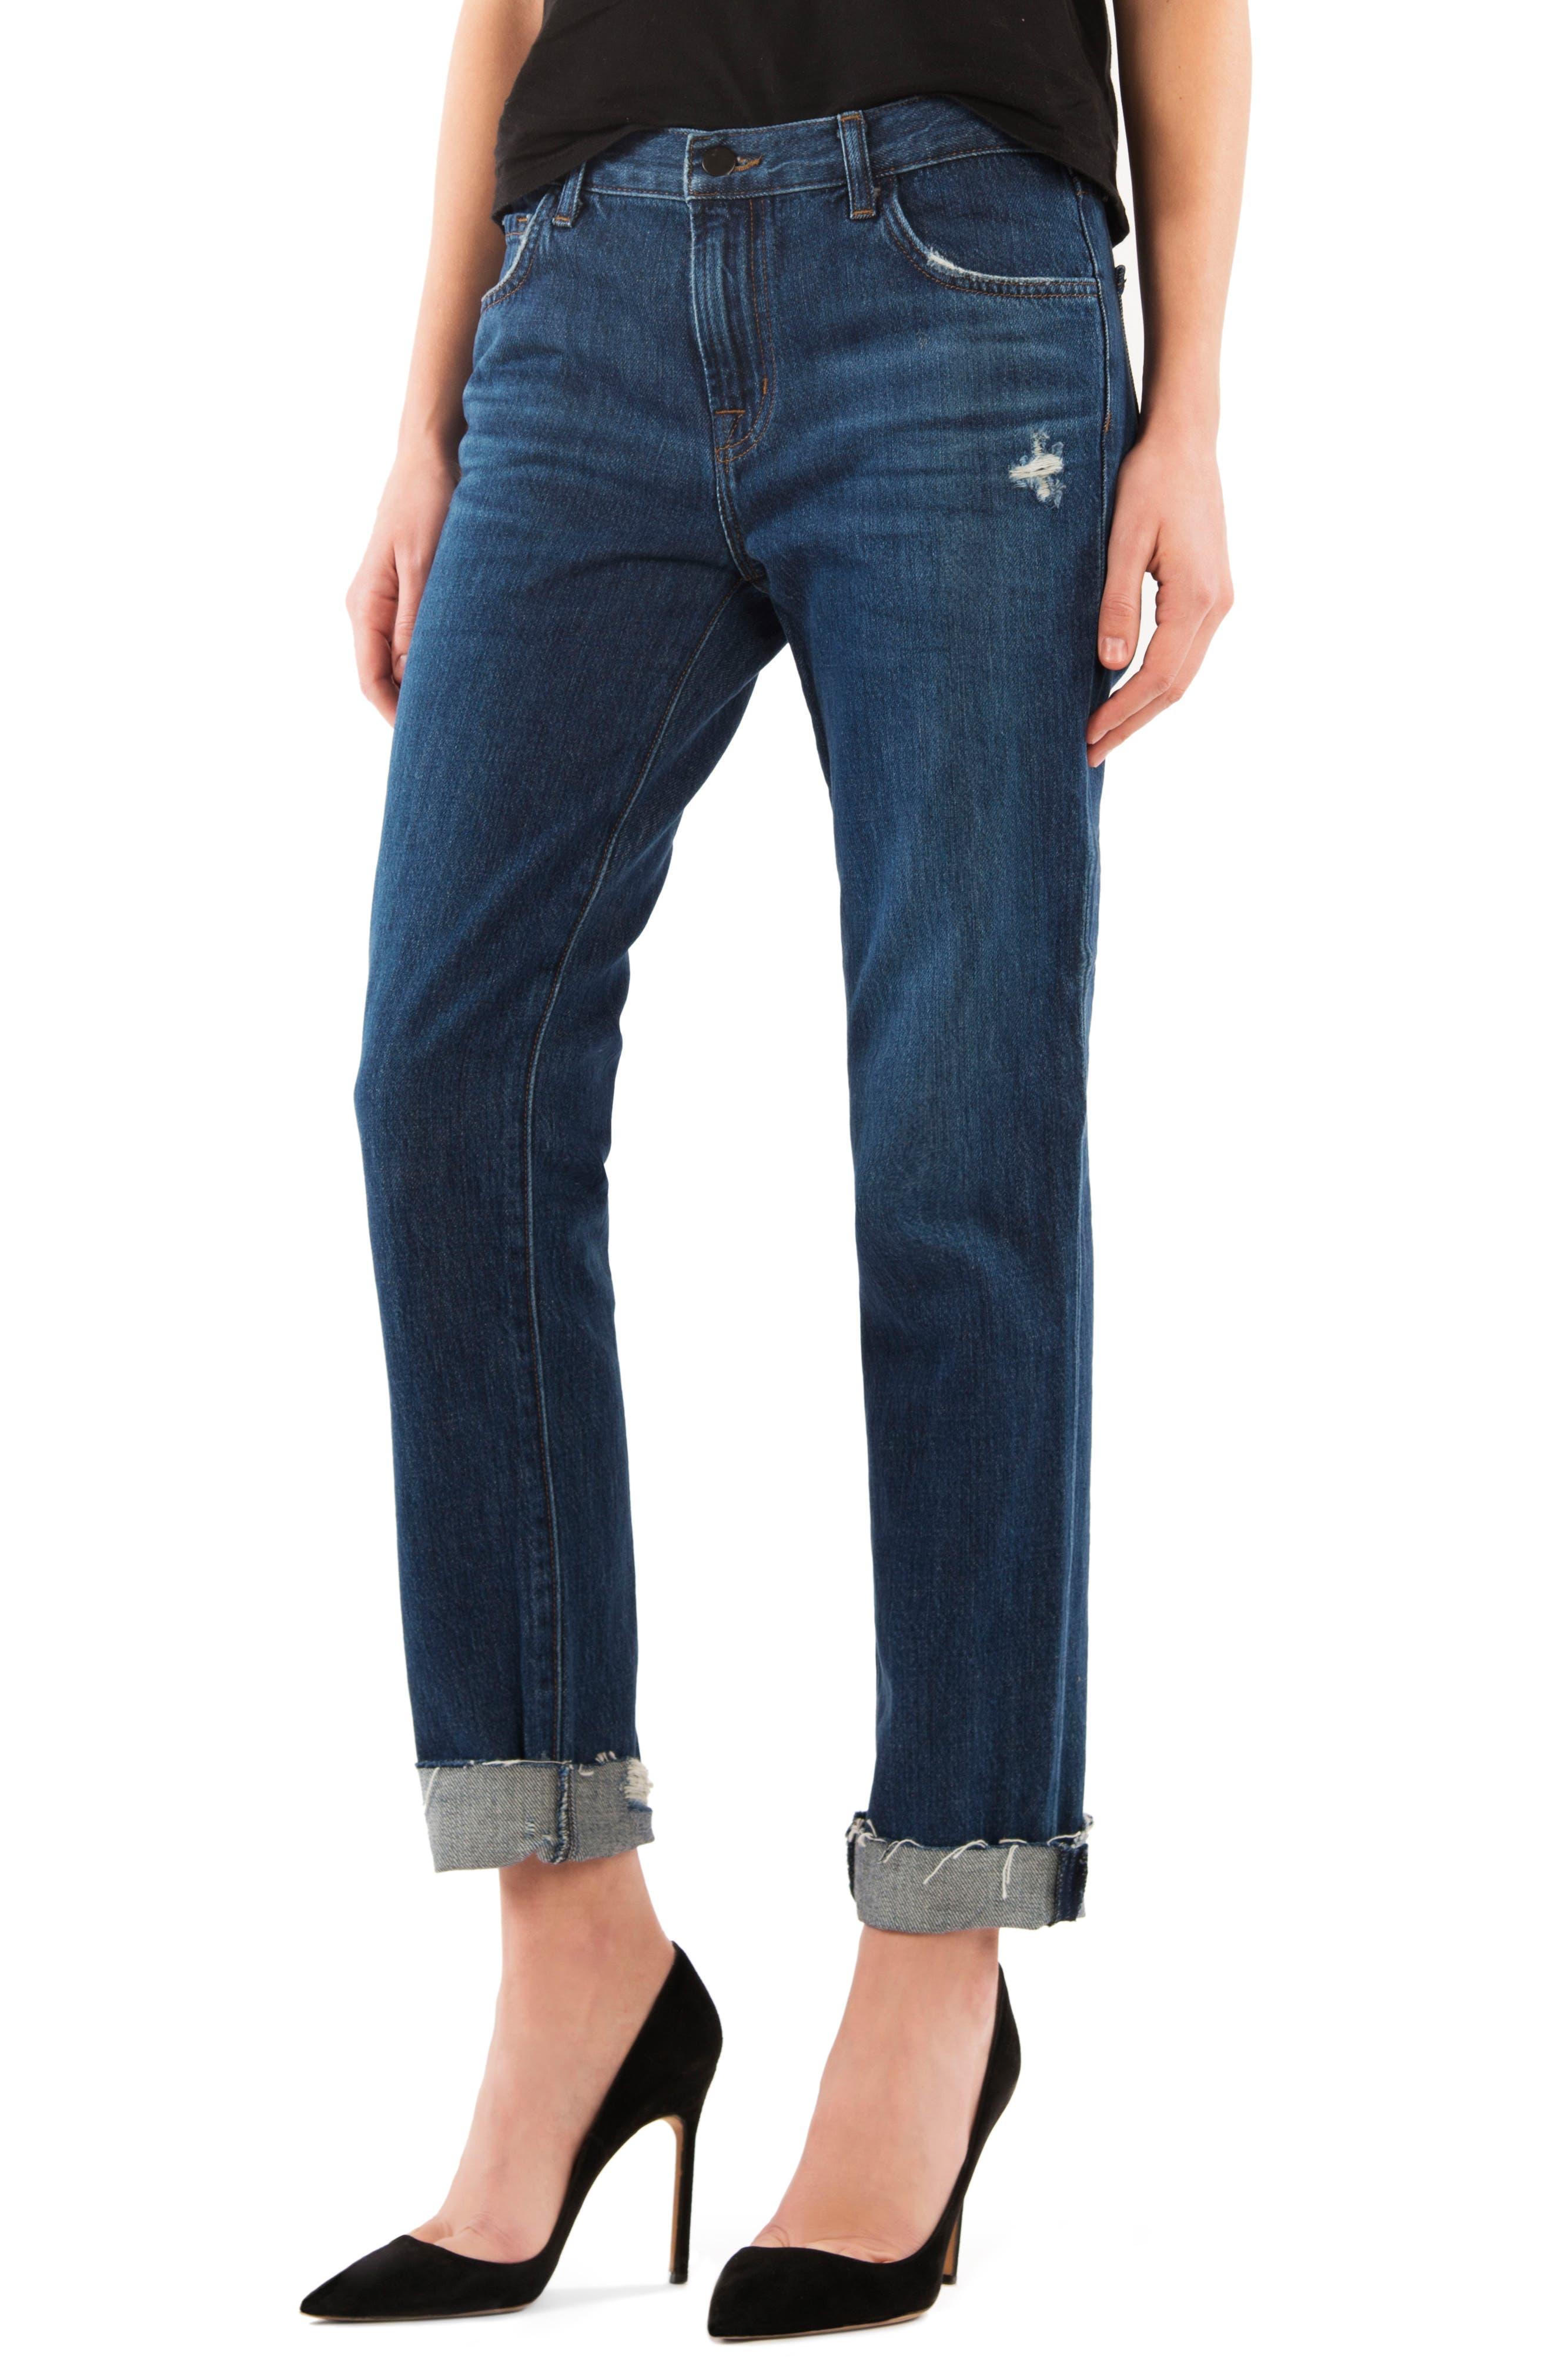 Johnny Mid Rise Boyfriend Jeans,                             Main thumbnail 1, color,                             Doubletake